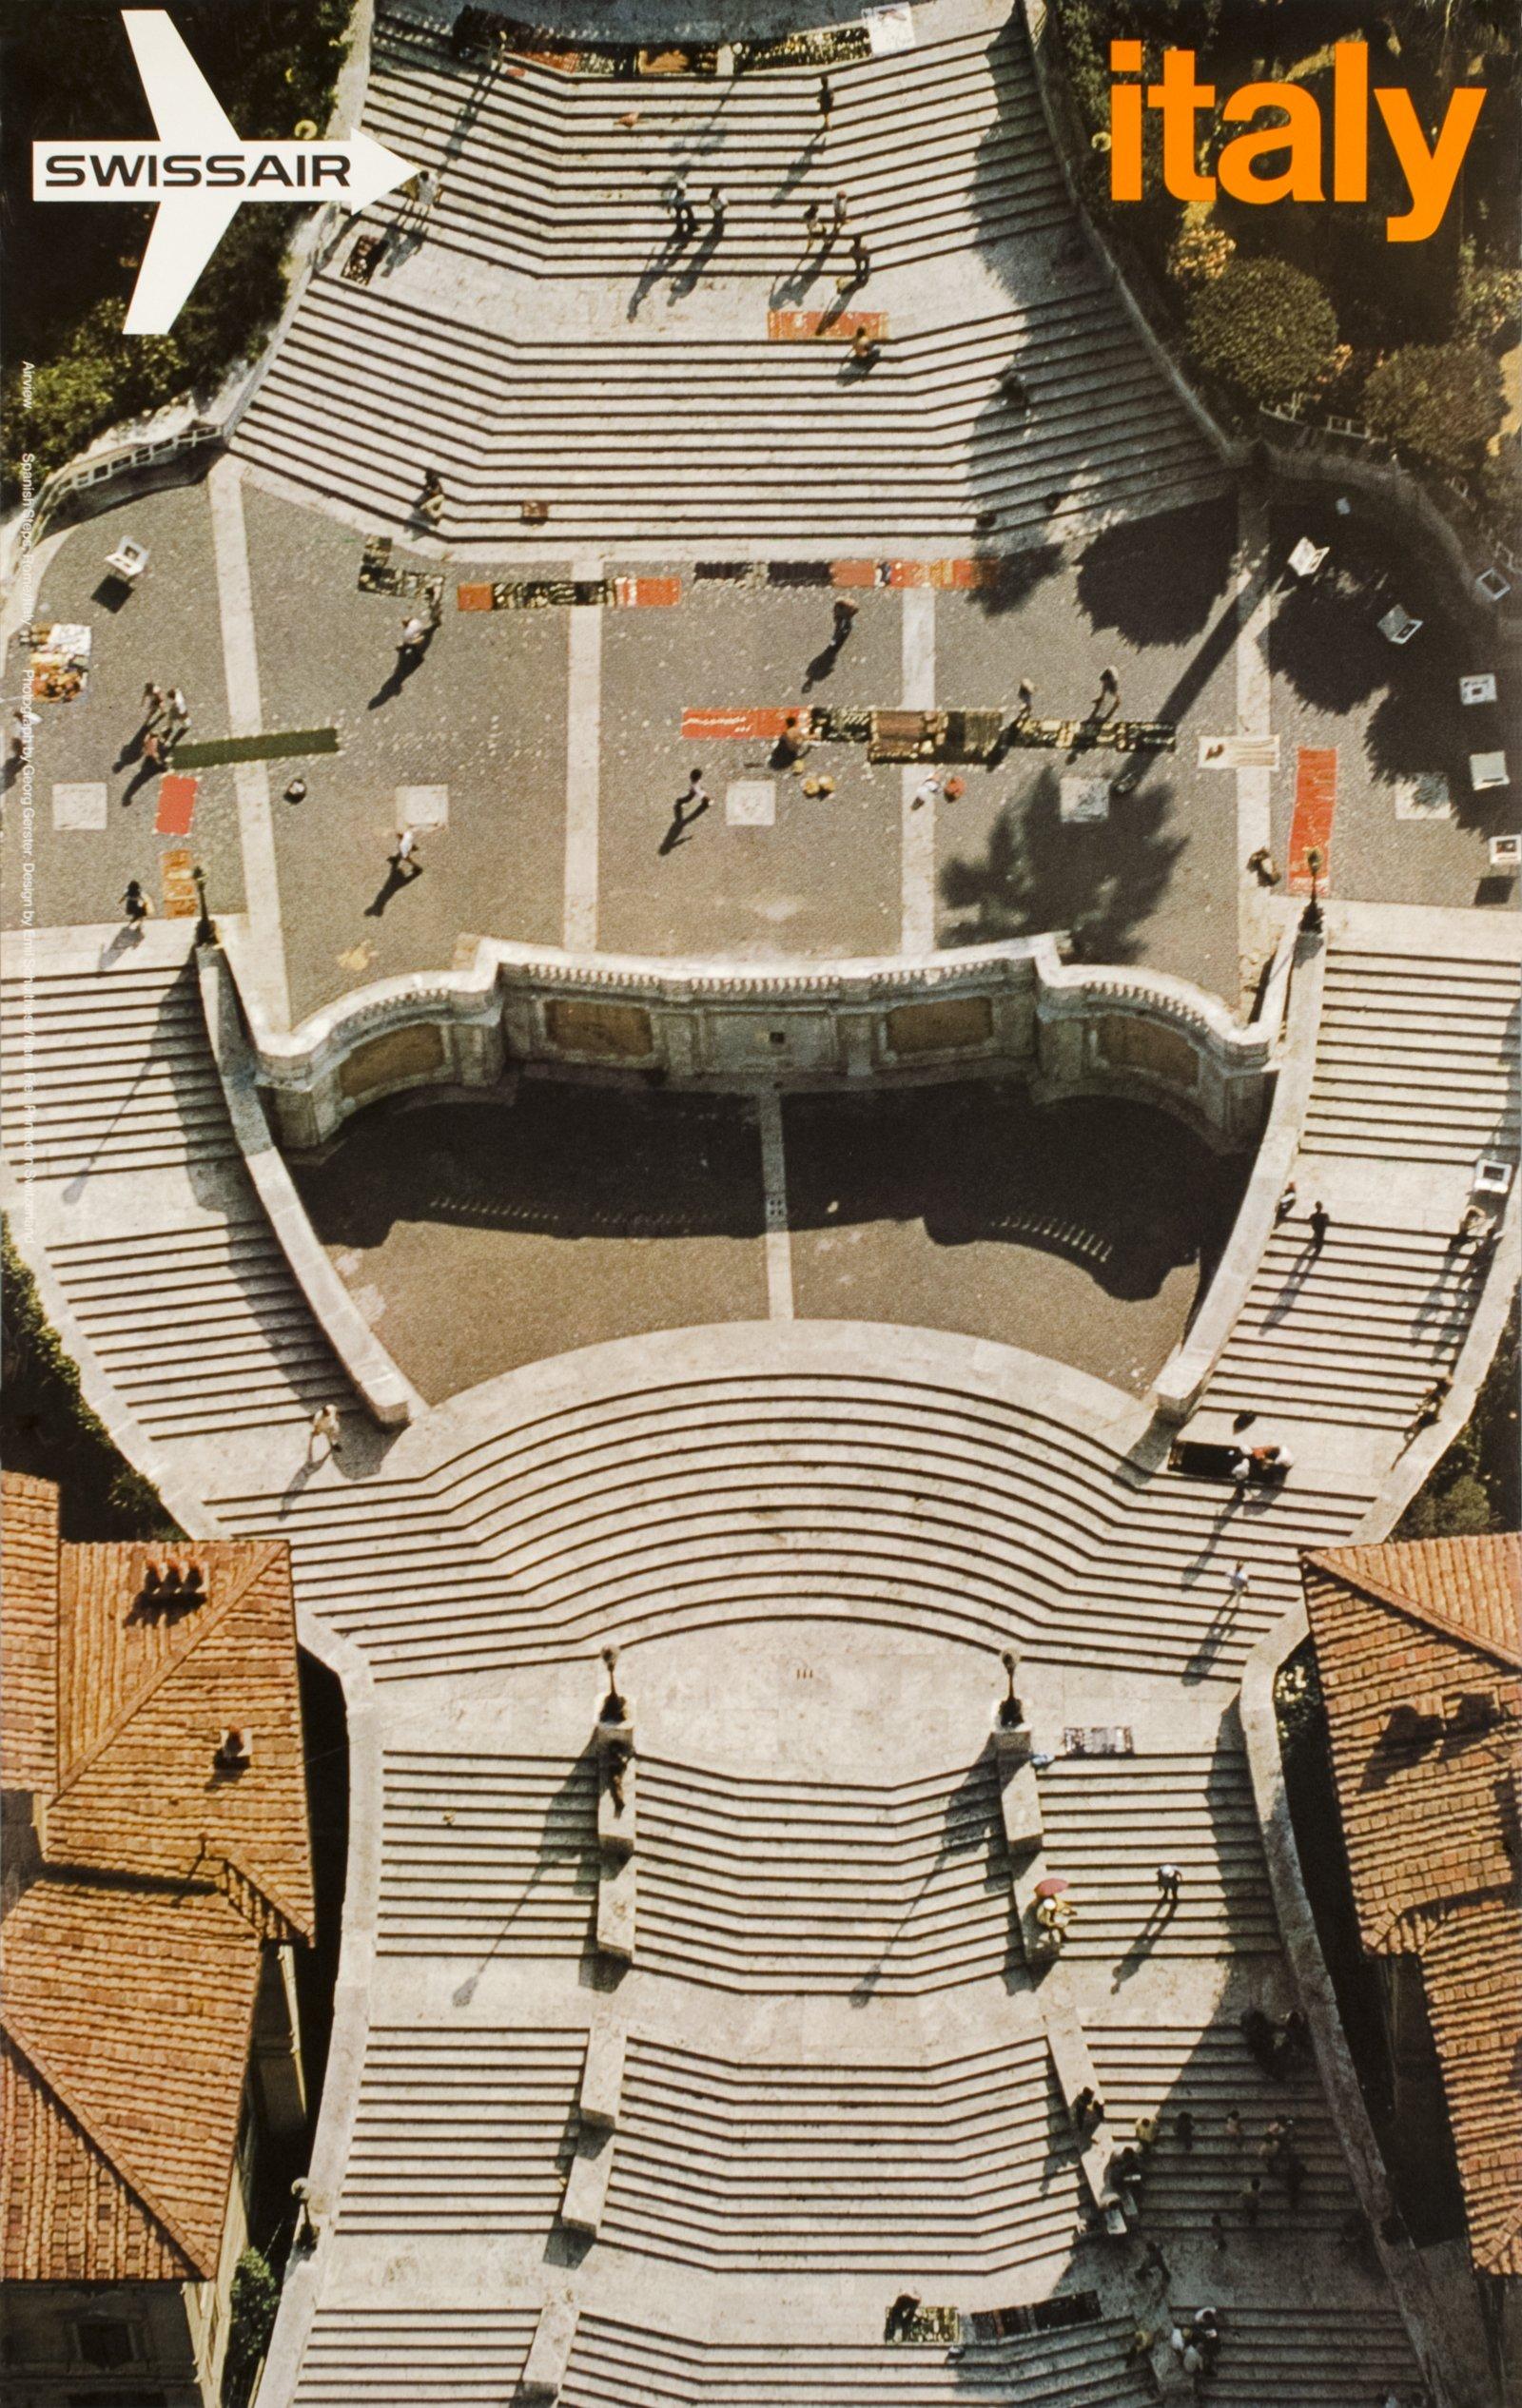 swissair roma italy spanish steps 31543 italy vintage